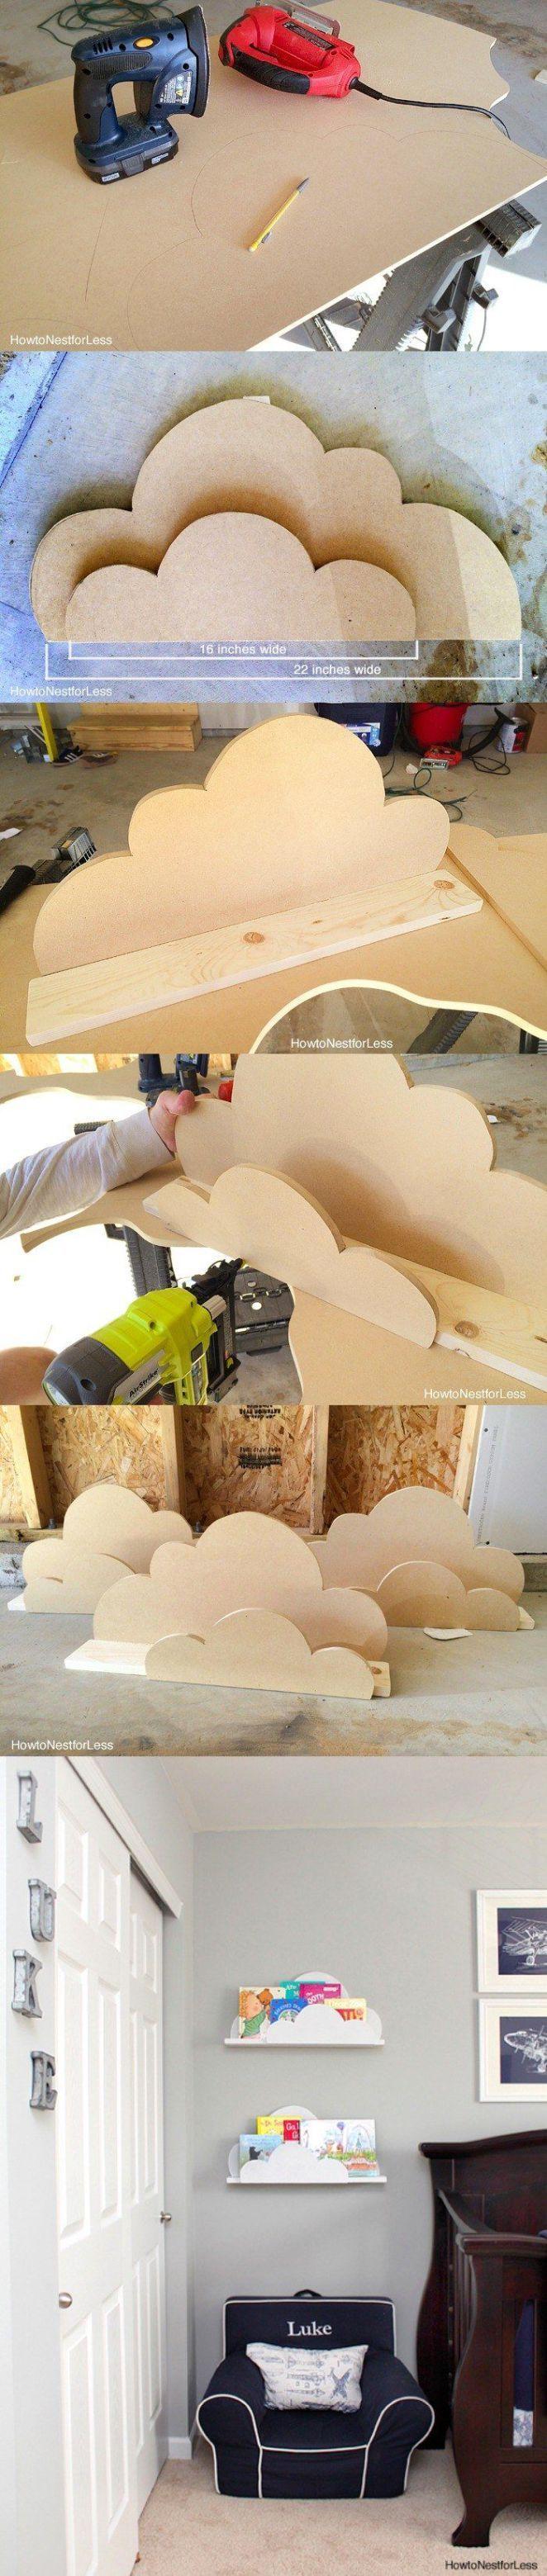 Relooking et décoration 2017 / 2018   En forme de nube  howtonestforless.com  Bibliothèque de bricolage Cloud